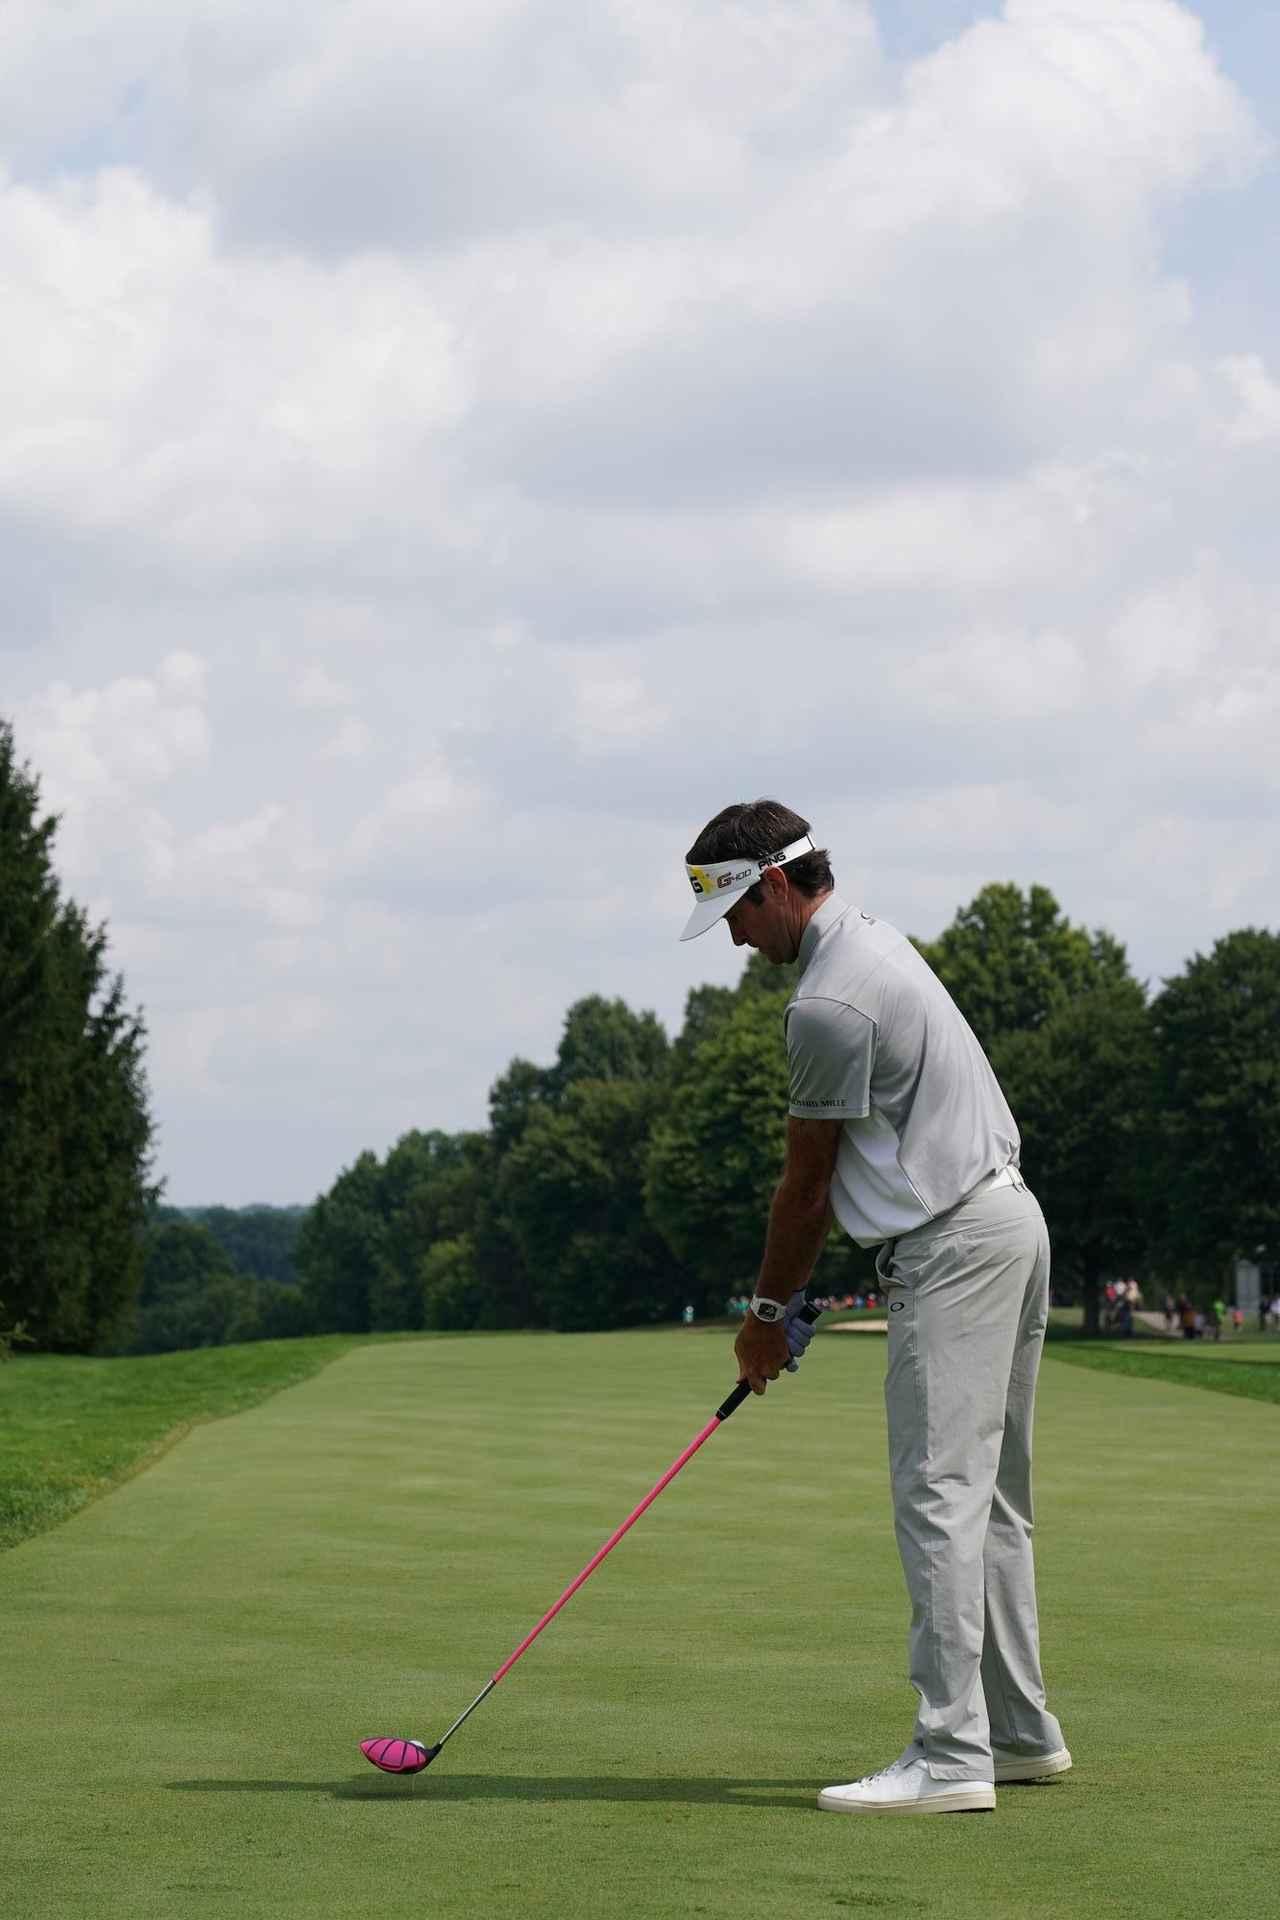 Images : 1番目の画像 - 強烈! バッバ・ワトソンのドライバーショット - みんなのゴルフダイジェスト